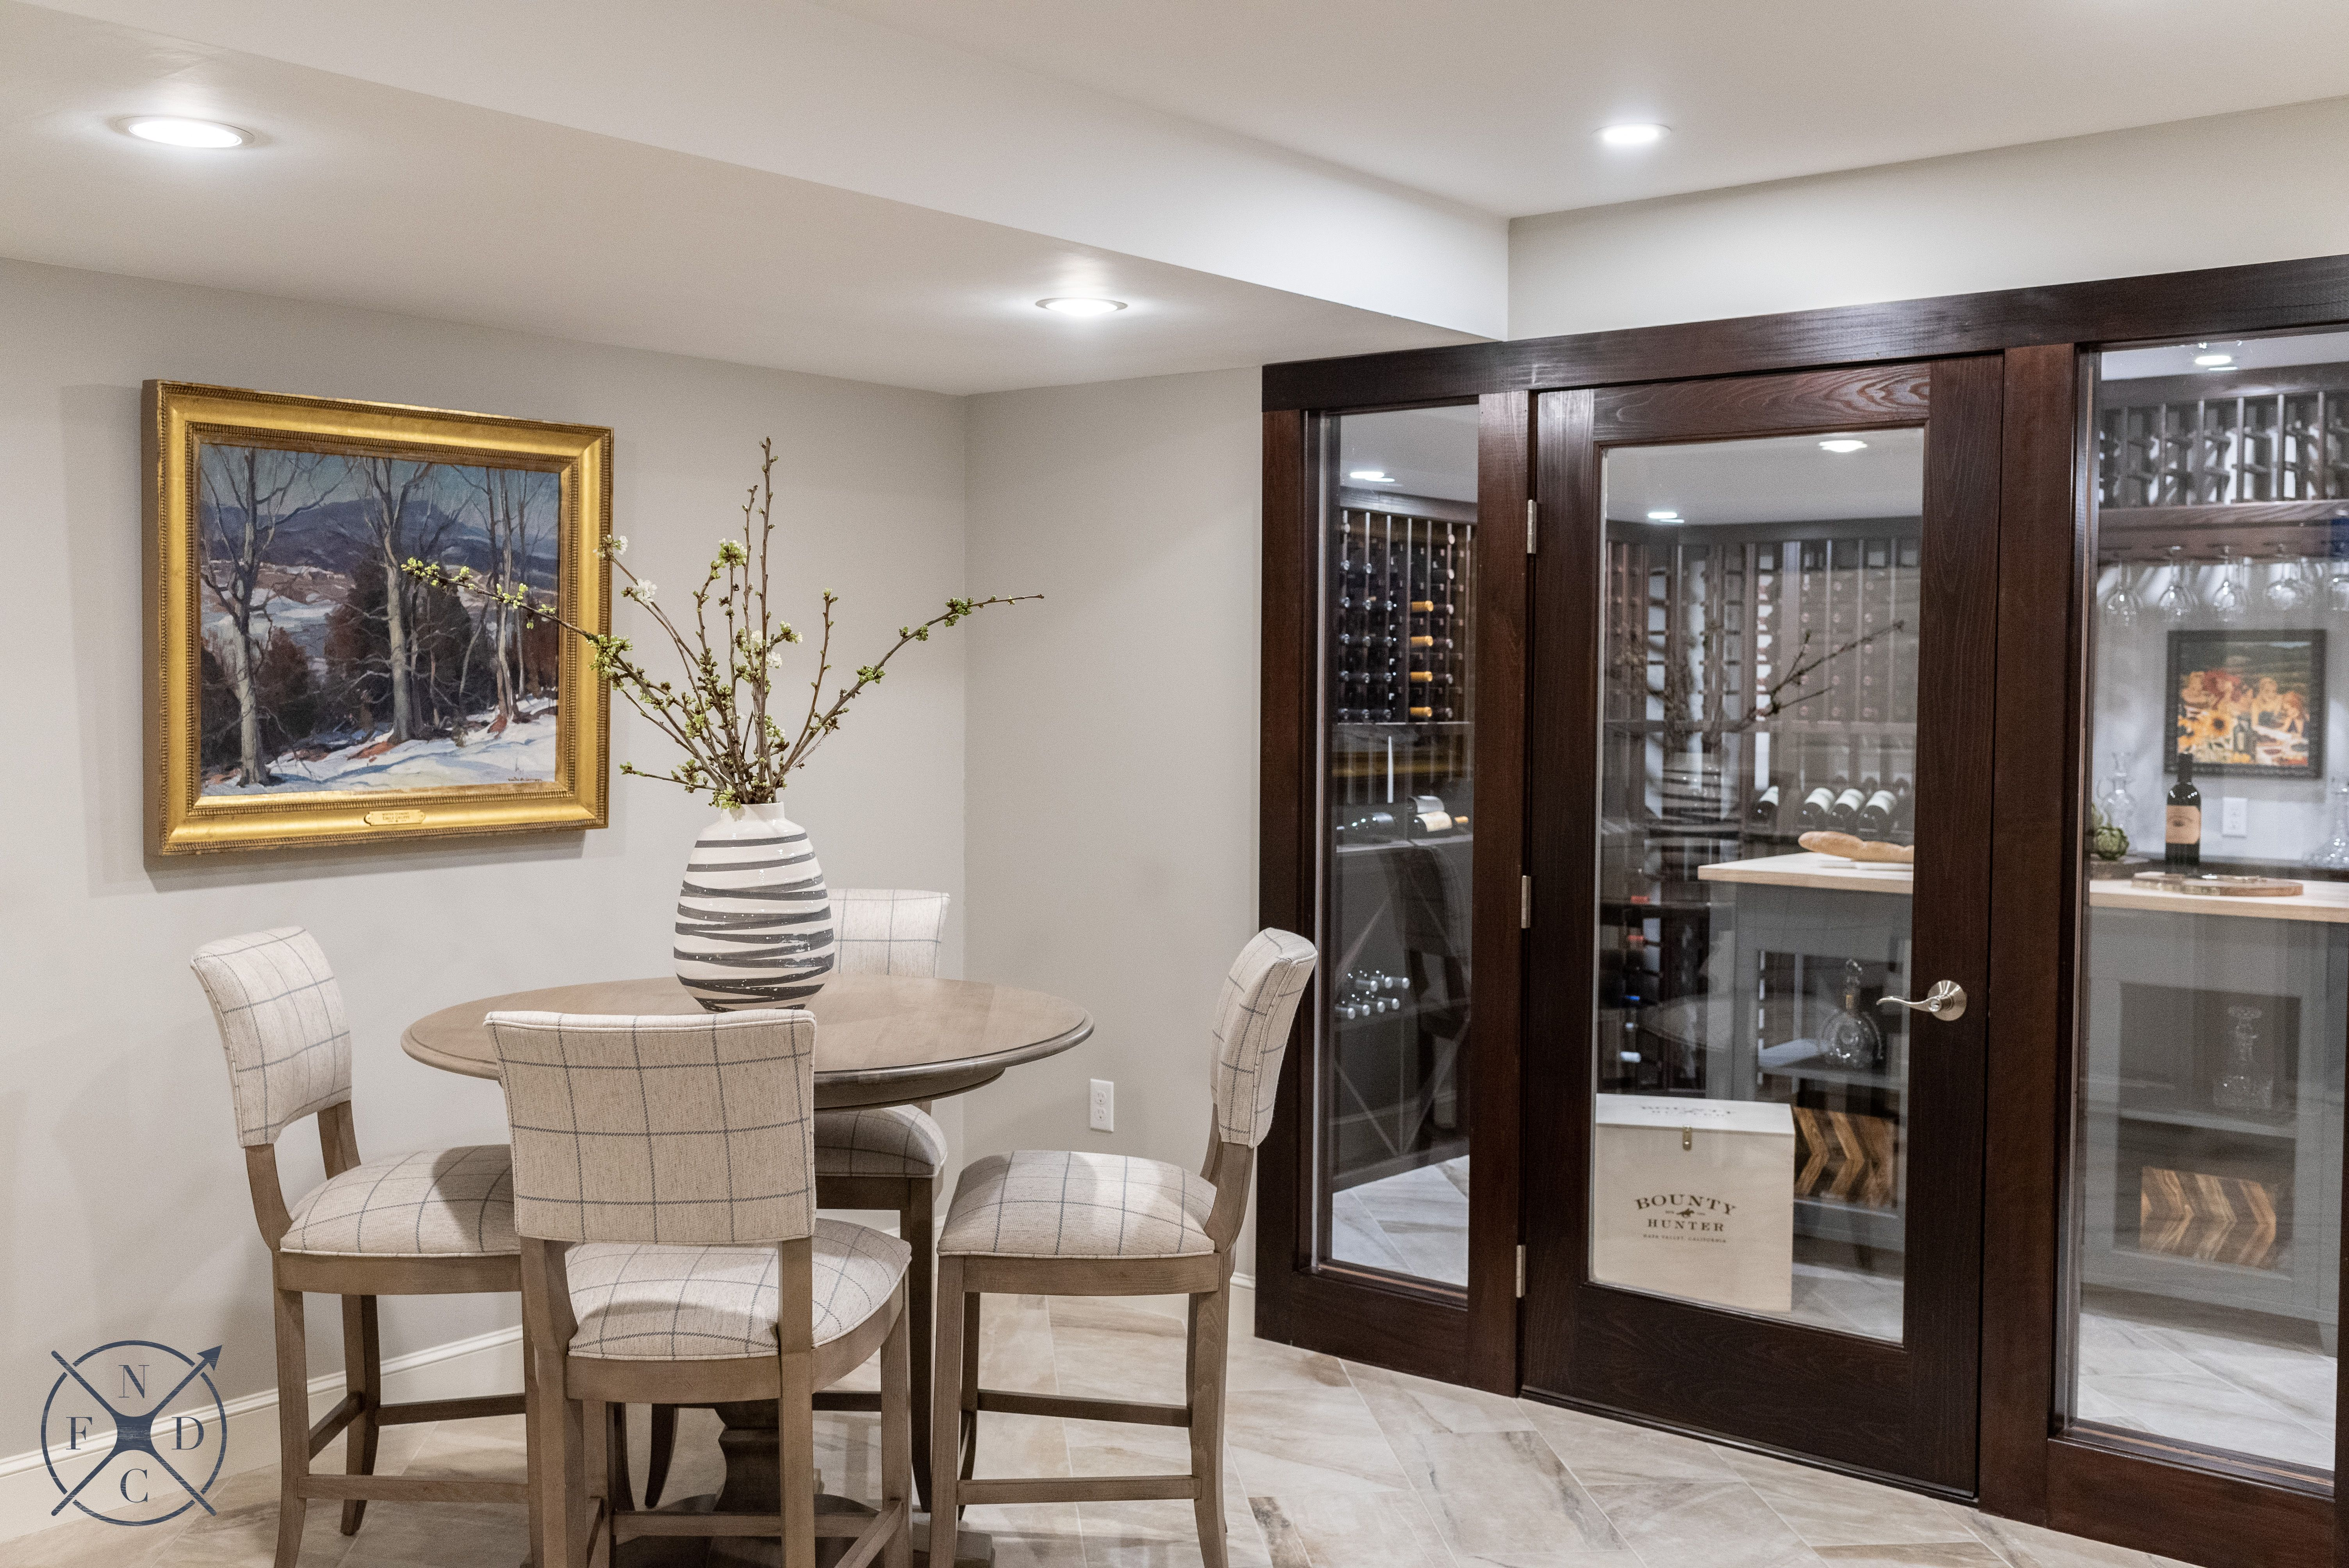 Winding Oaks Project I Boxford Ma Interior Design Companies Forks Design Home Decor